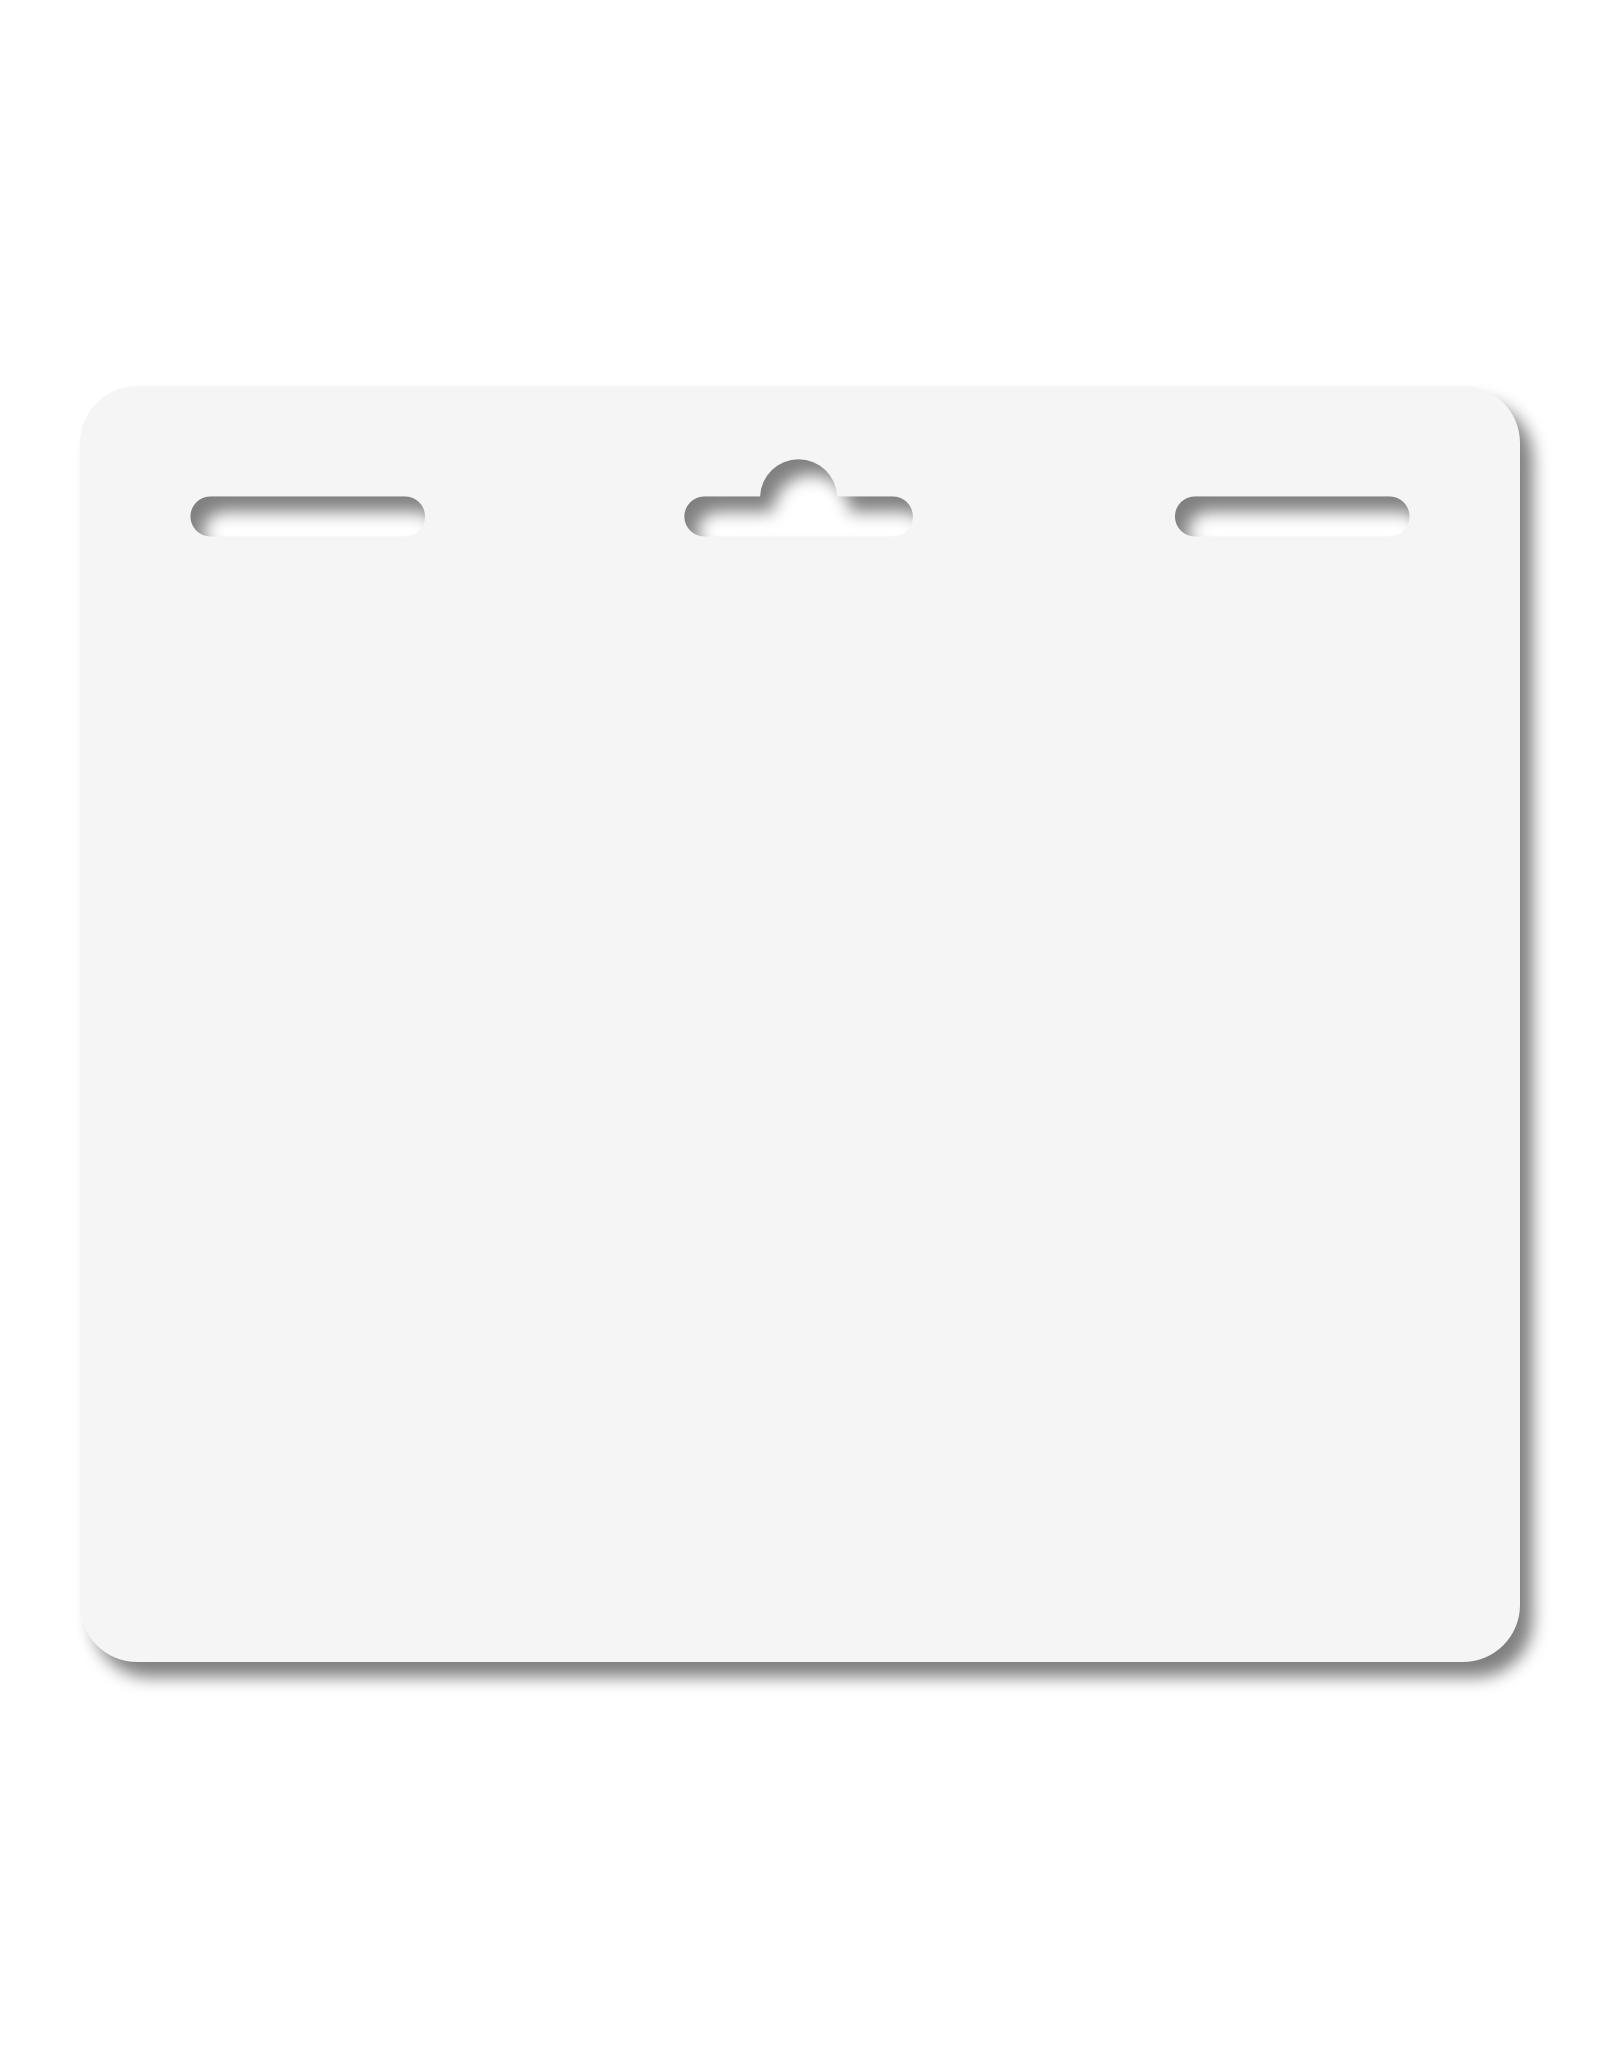 MeetingLinq Butterfly Badge zum Kleben - Doppelseitig, ohne Folie, Medium, 3 schlitze